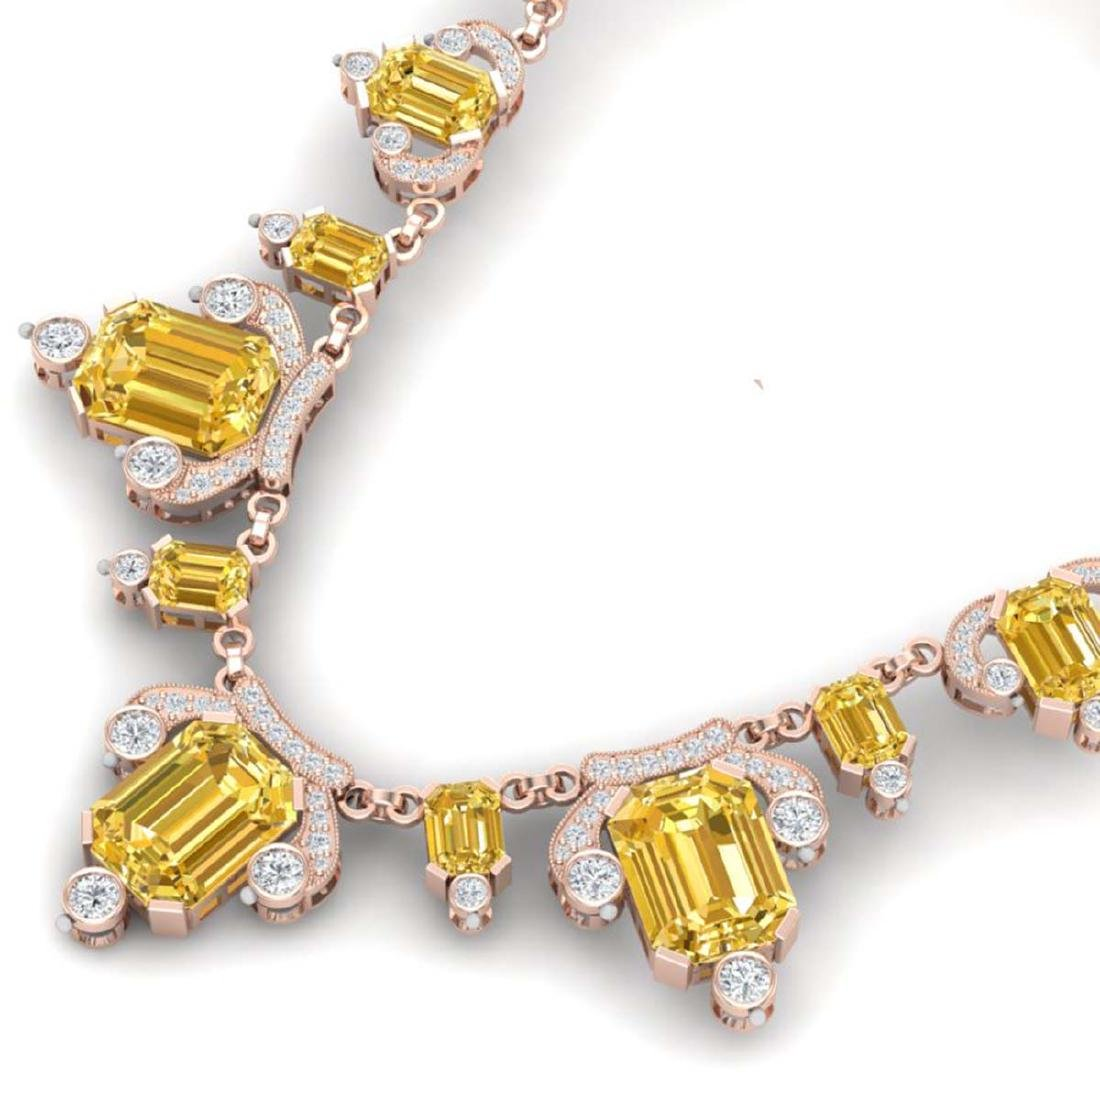 71.48 ctw Canary Citrine & VS Diamond Necklace 18K Rose - 2